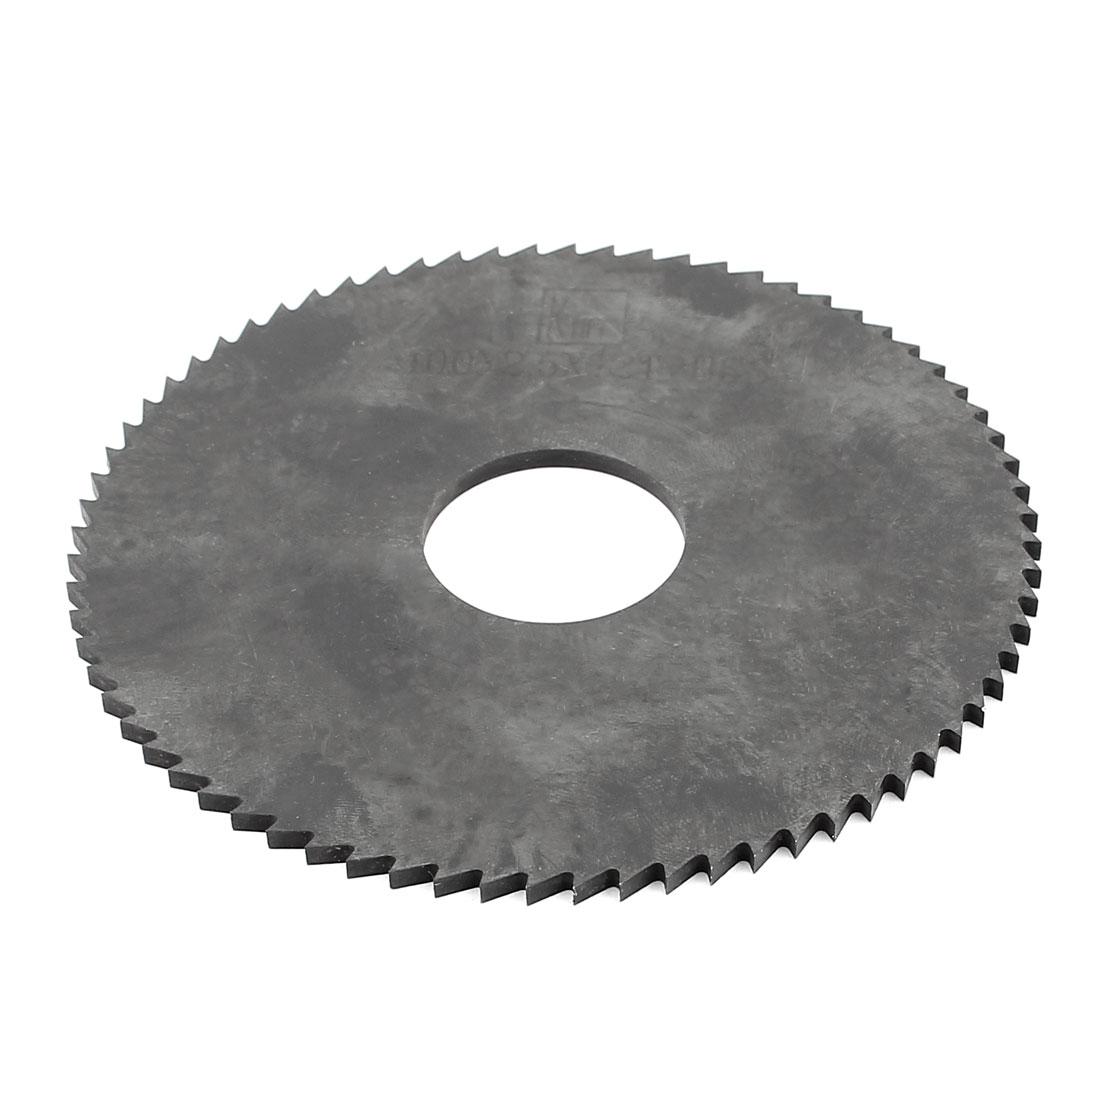 Hand Tool 100mm x 22mm x 2.5mm 72 Peg Teeth HSS Slitting Saw Cutter